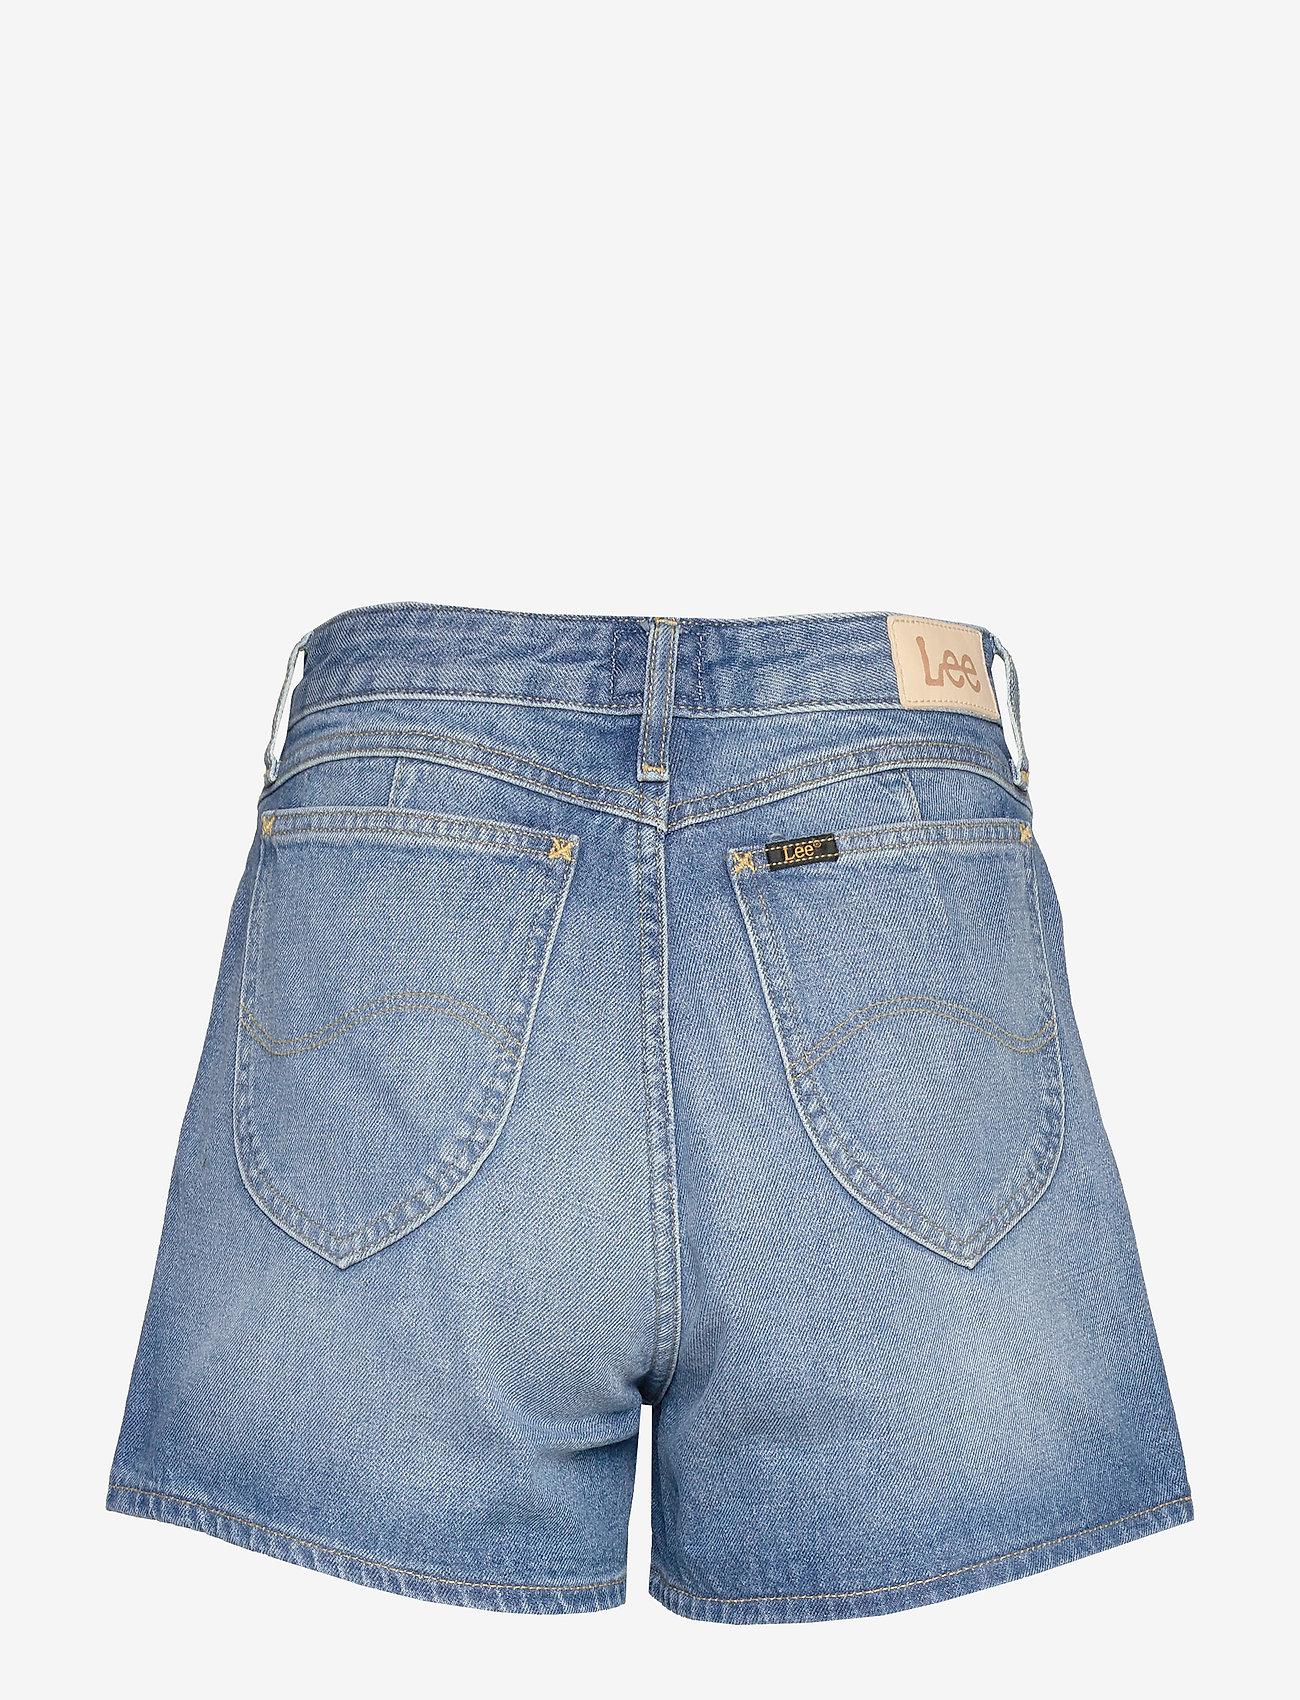 Lee Jeans - THELMA SHORT - denimshorts - worn callie - 1